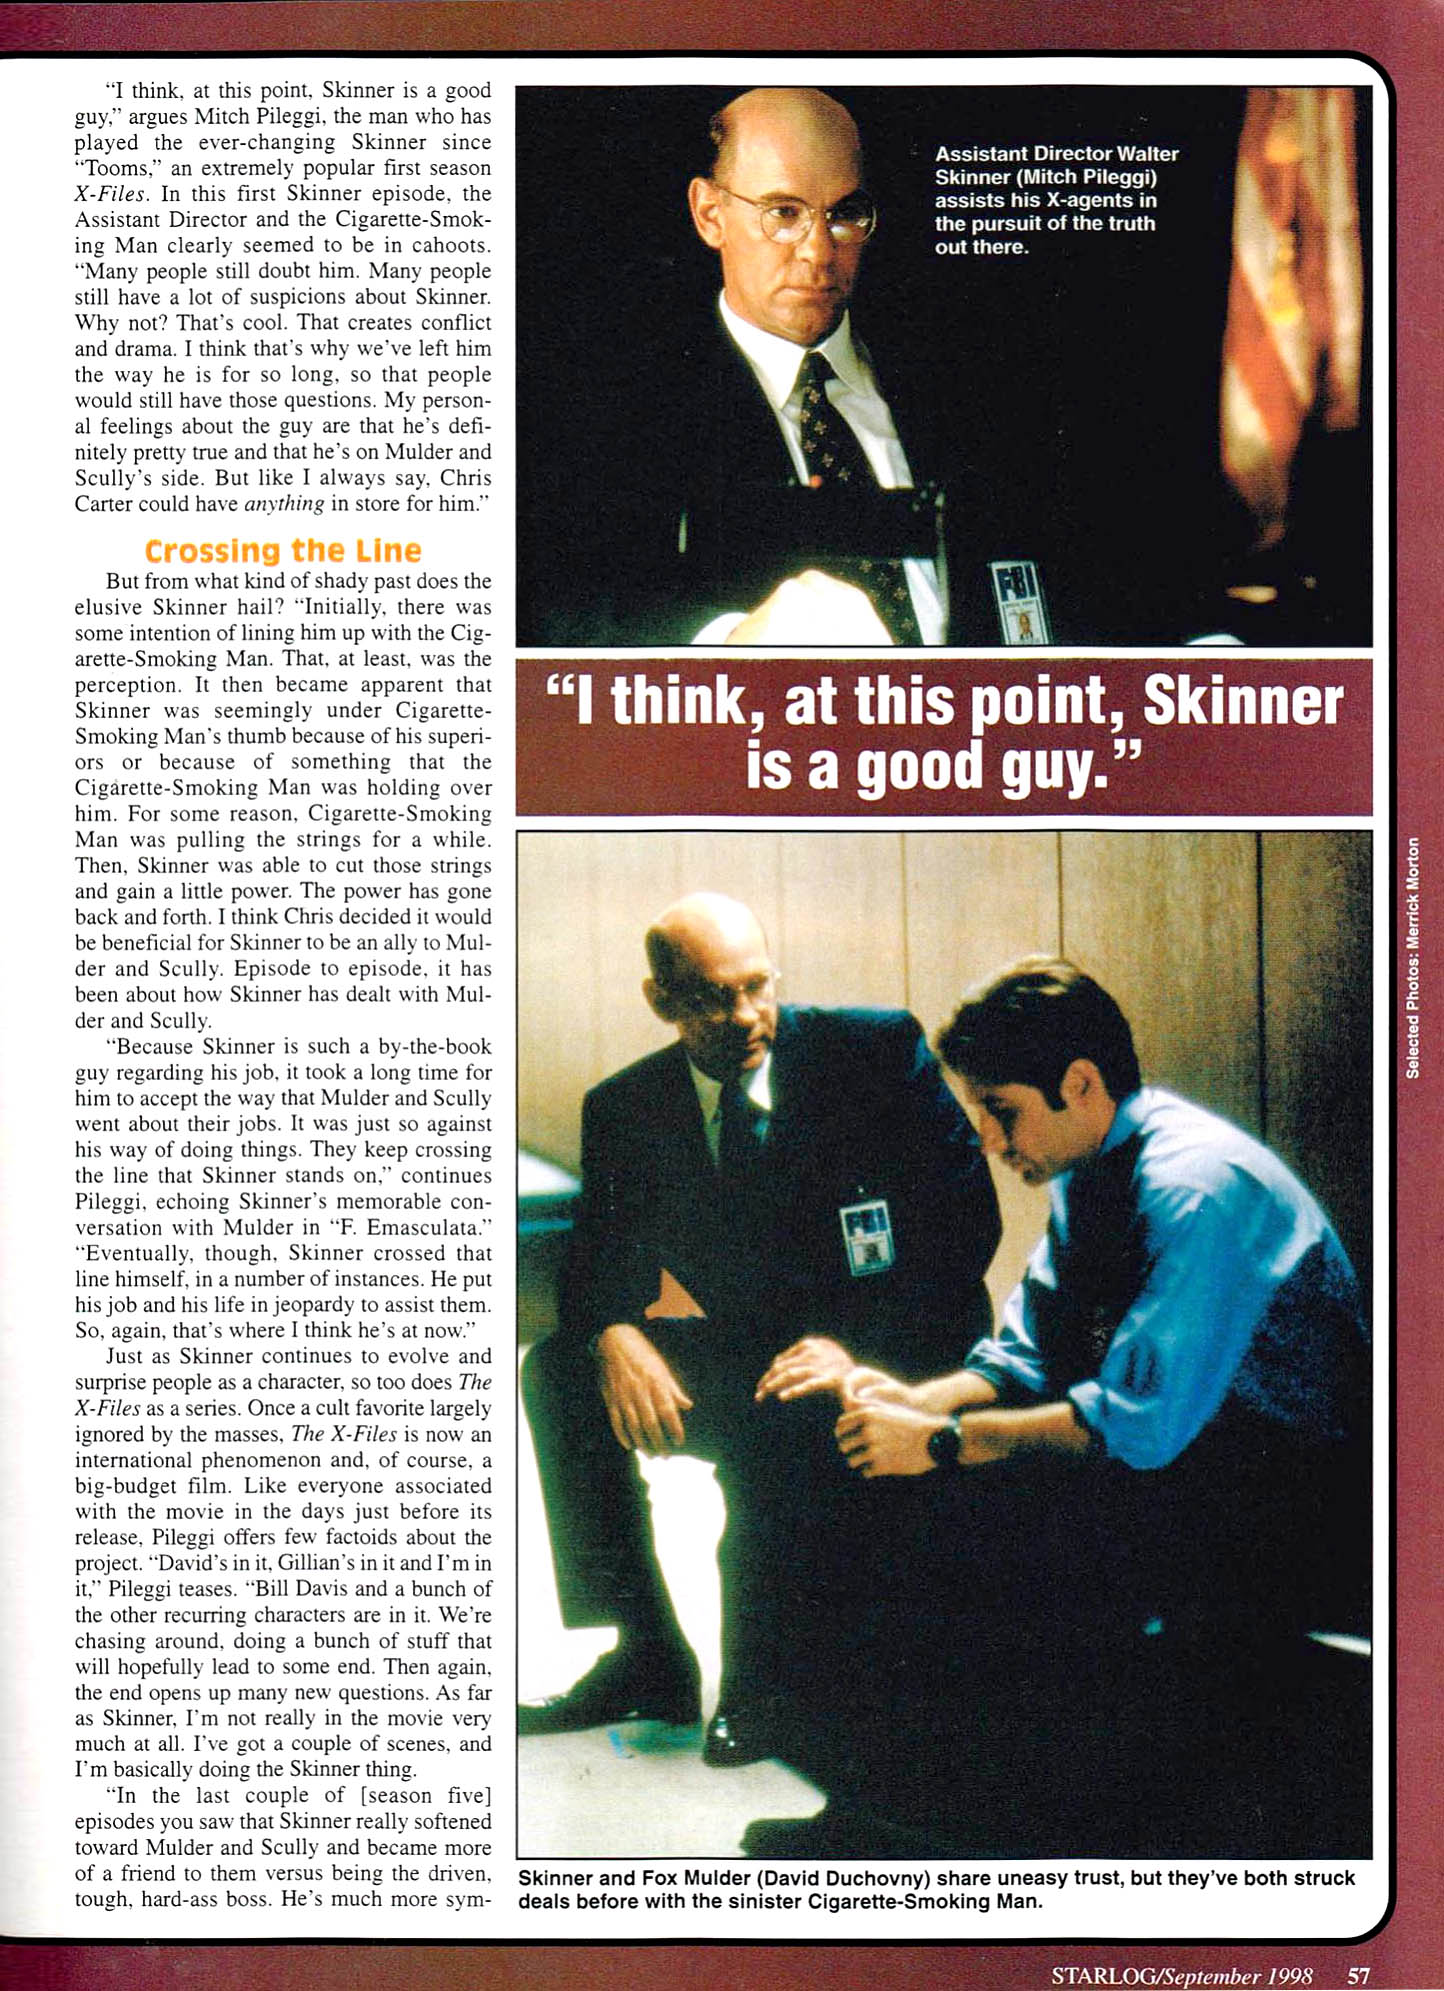 Starlog 254 1998 09 X-Files-2.jpg